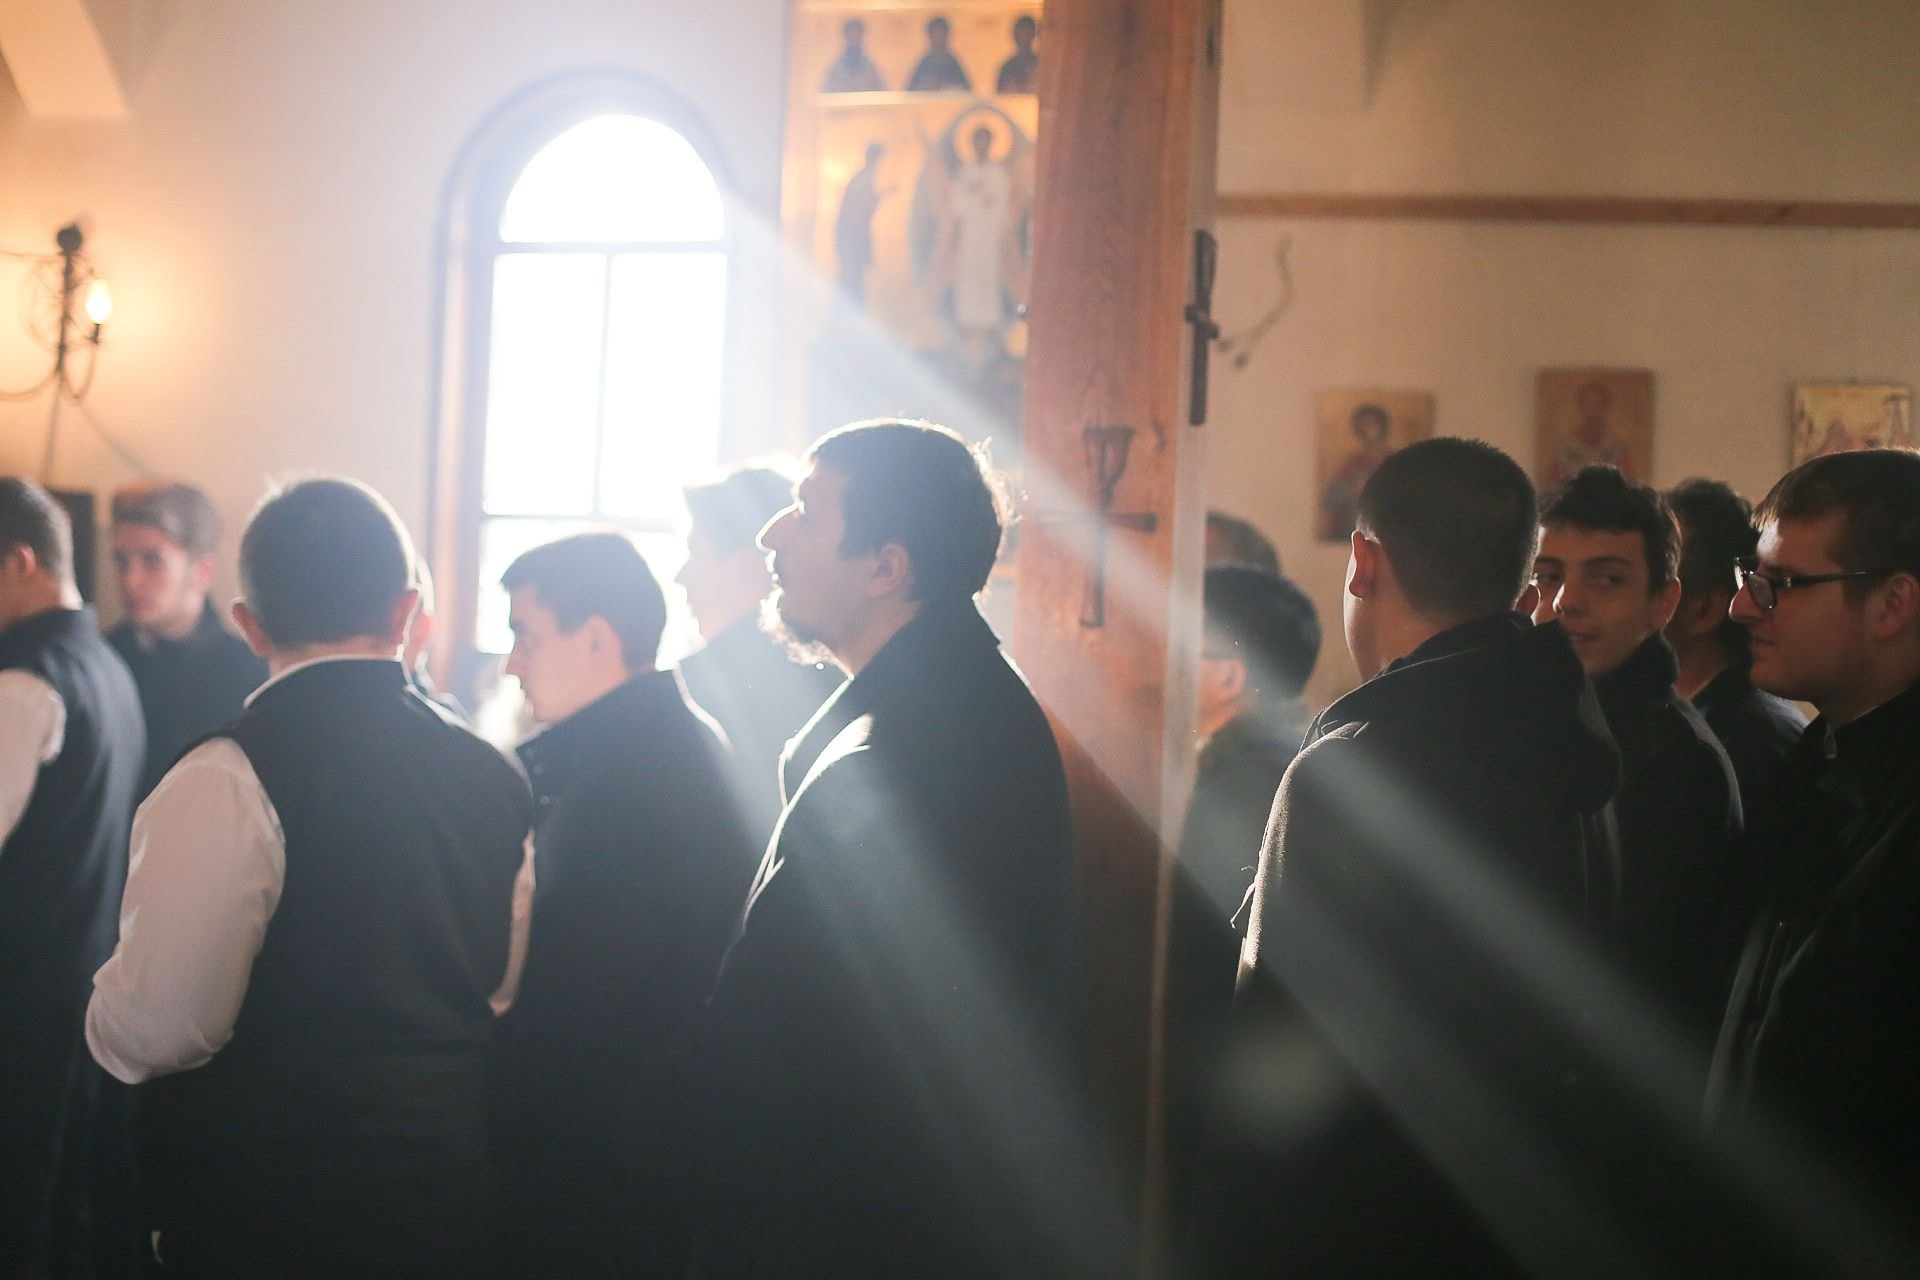 https://sites.google.com/a/seminararad.org/site-principal/20-de-ani-de-la-infiintarea-seminarului-teologic-ortodox-din-arad/9-He385TSauBBpZpM_BKfLIFK6Gmdk9ymRwA3CZmomc.jpg